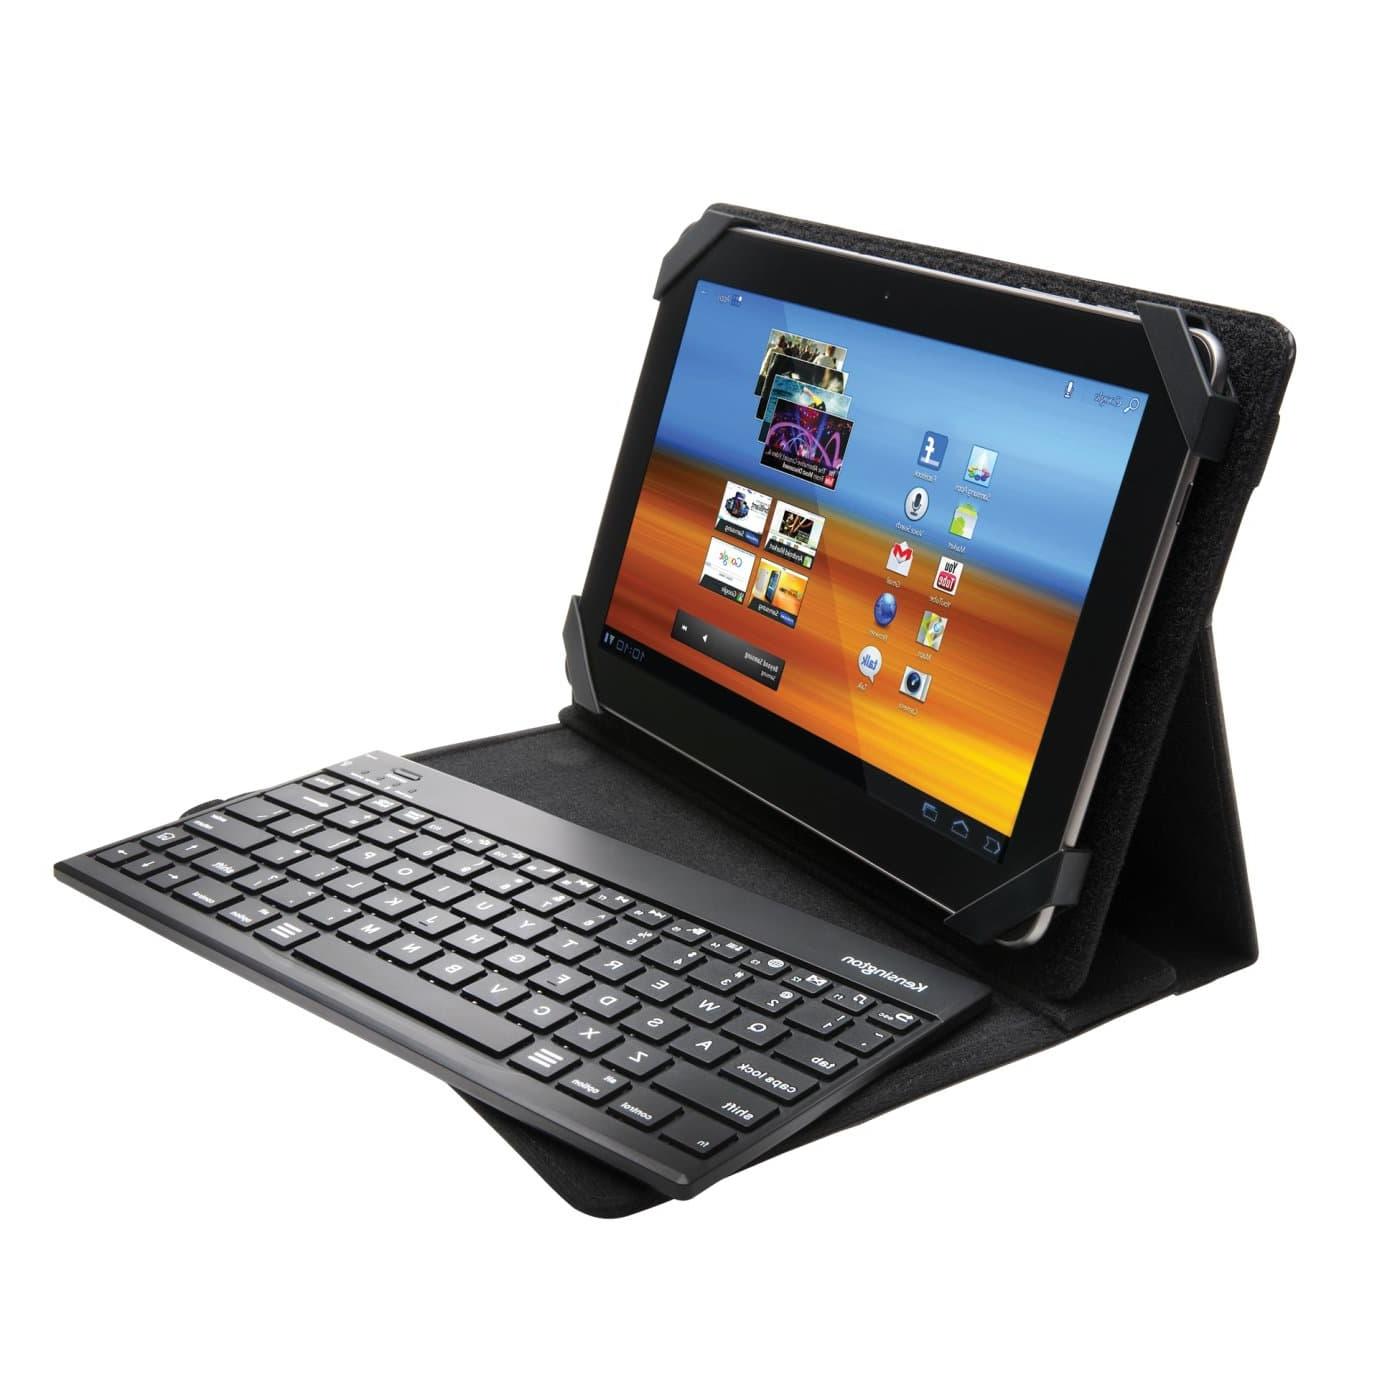 Accesorios Para Tablet Kvdd Kensington Productos Accesorios Para Tablets Y Smartphones